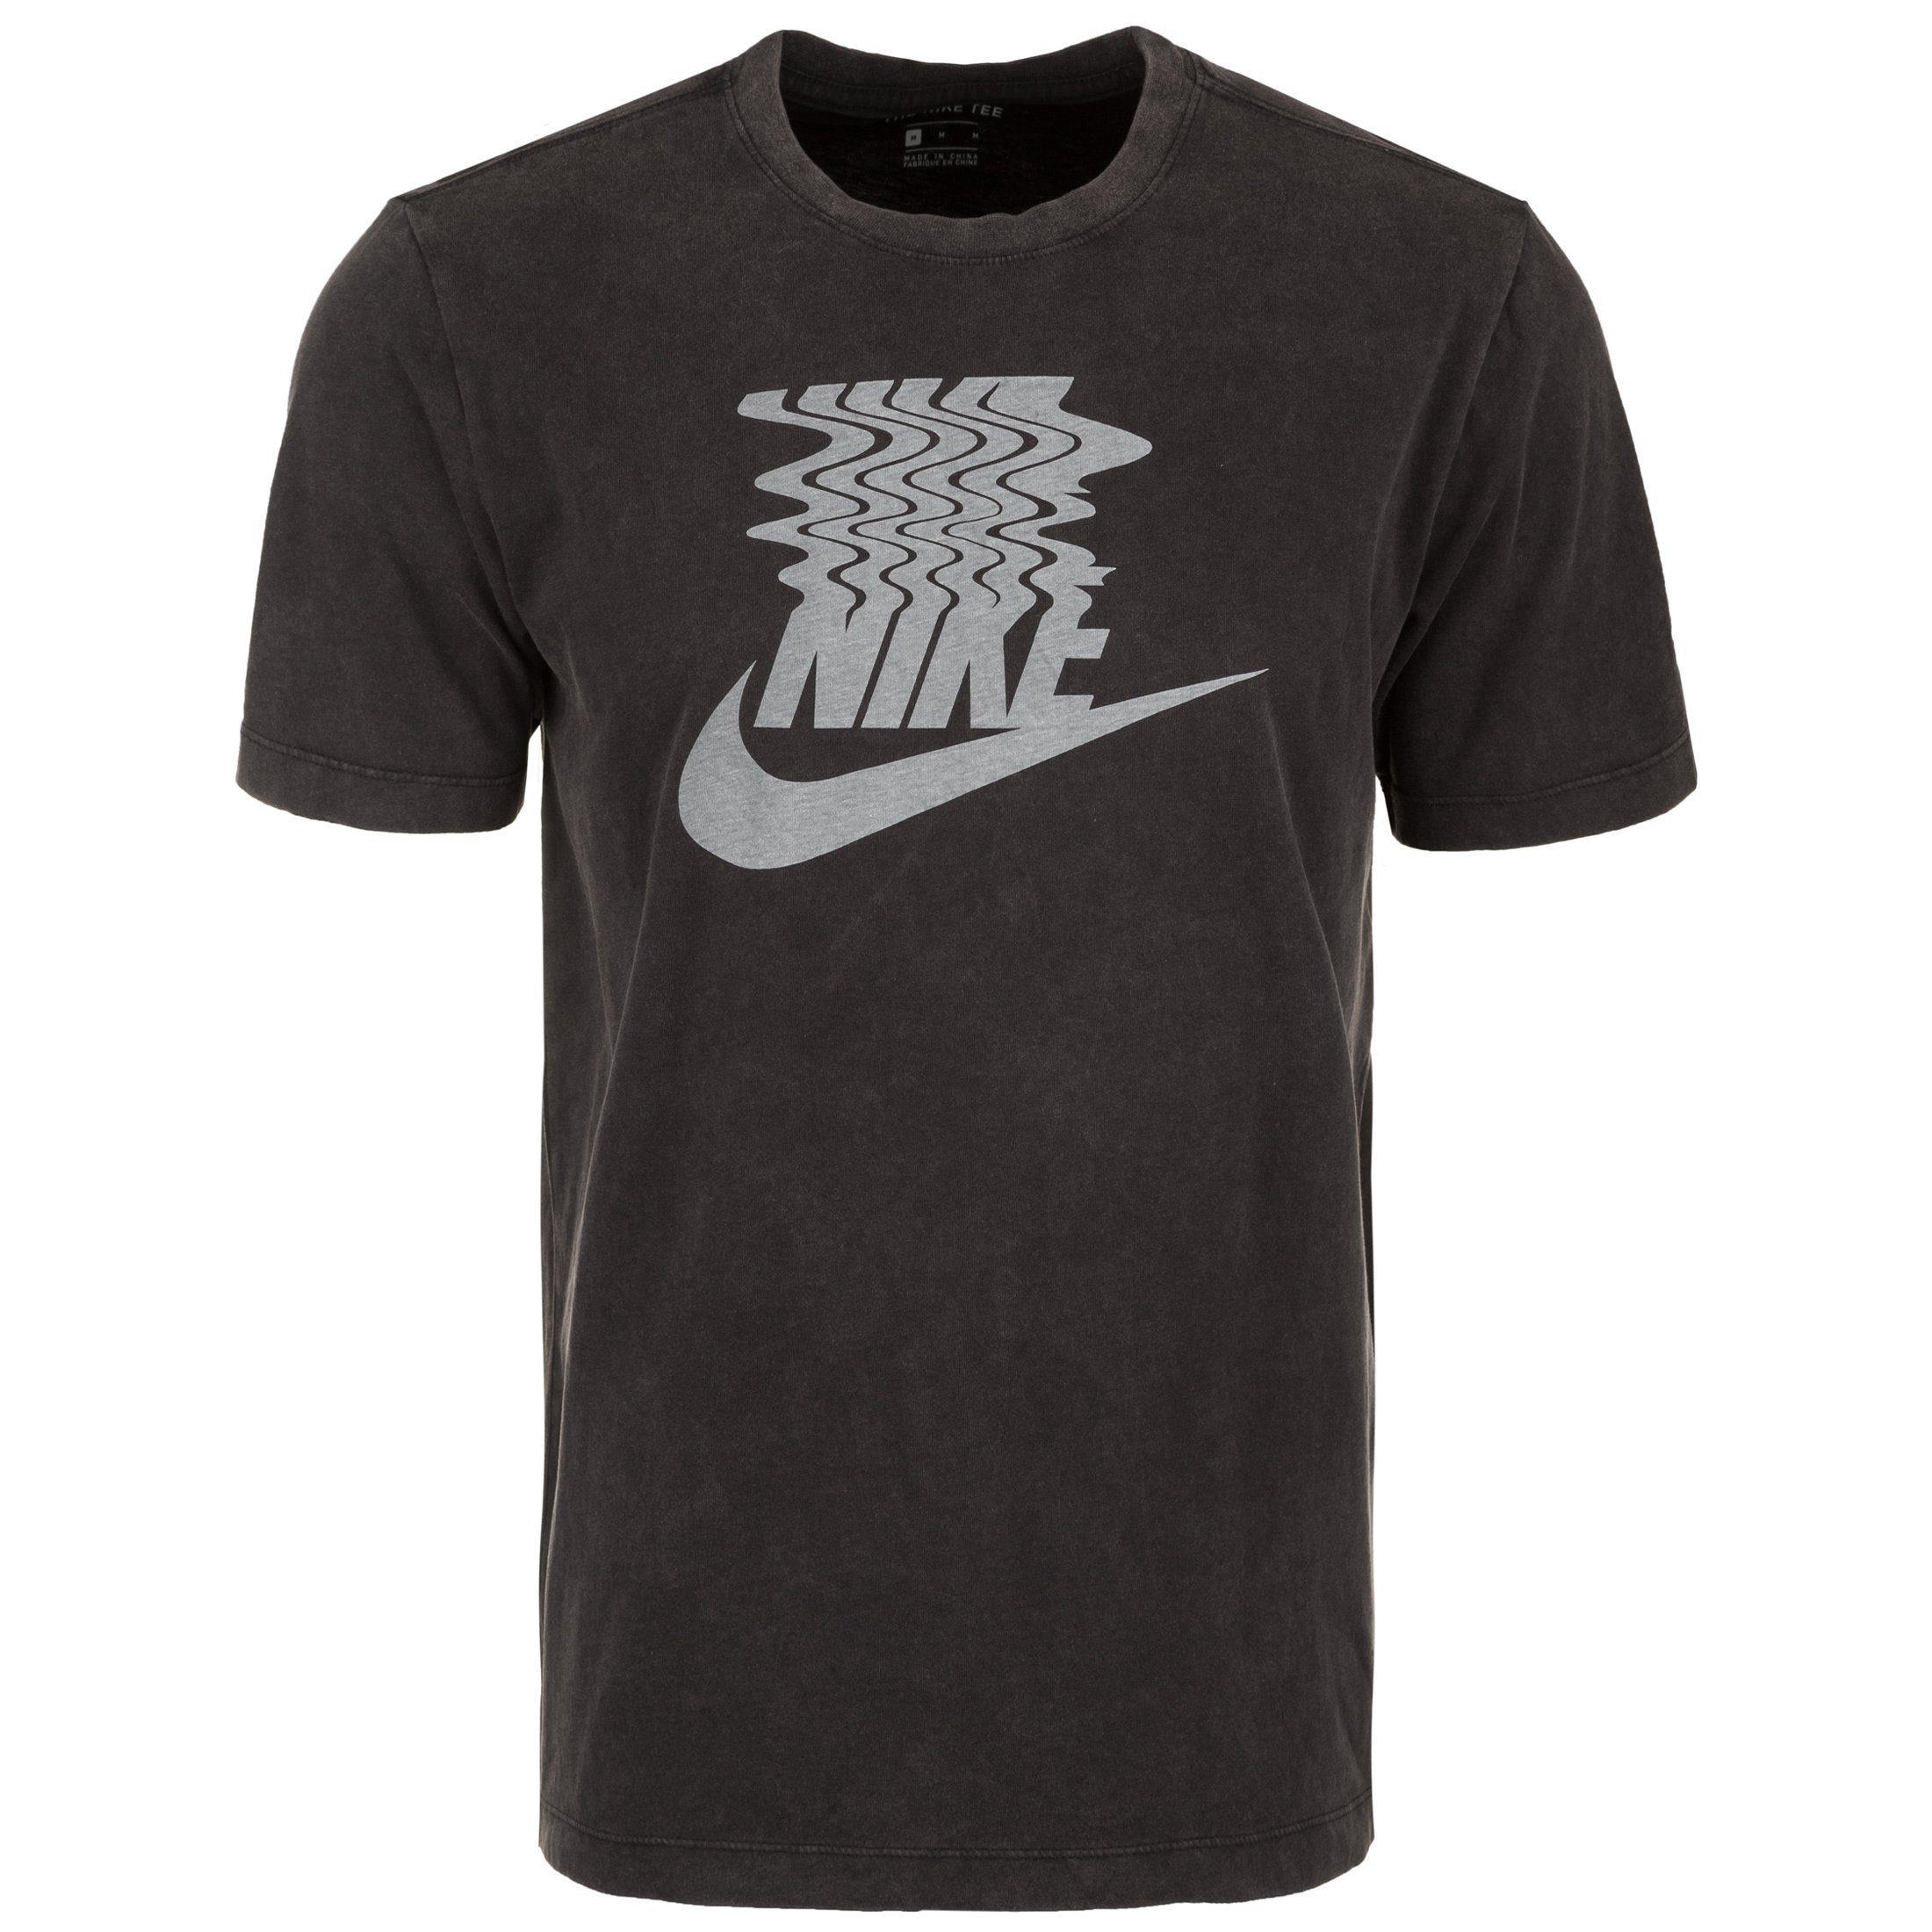 Nike Sportswear T-Shirt Statement | Sportbekleidung > Sportshirts > T-Shirts | Schwarz | Nike Sportswear